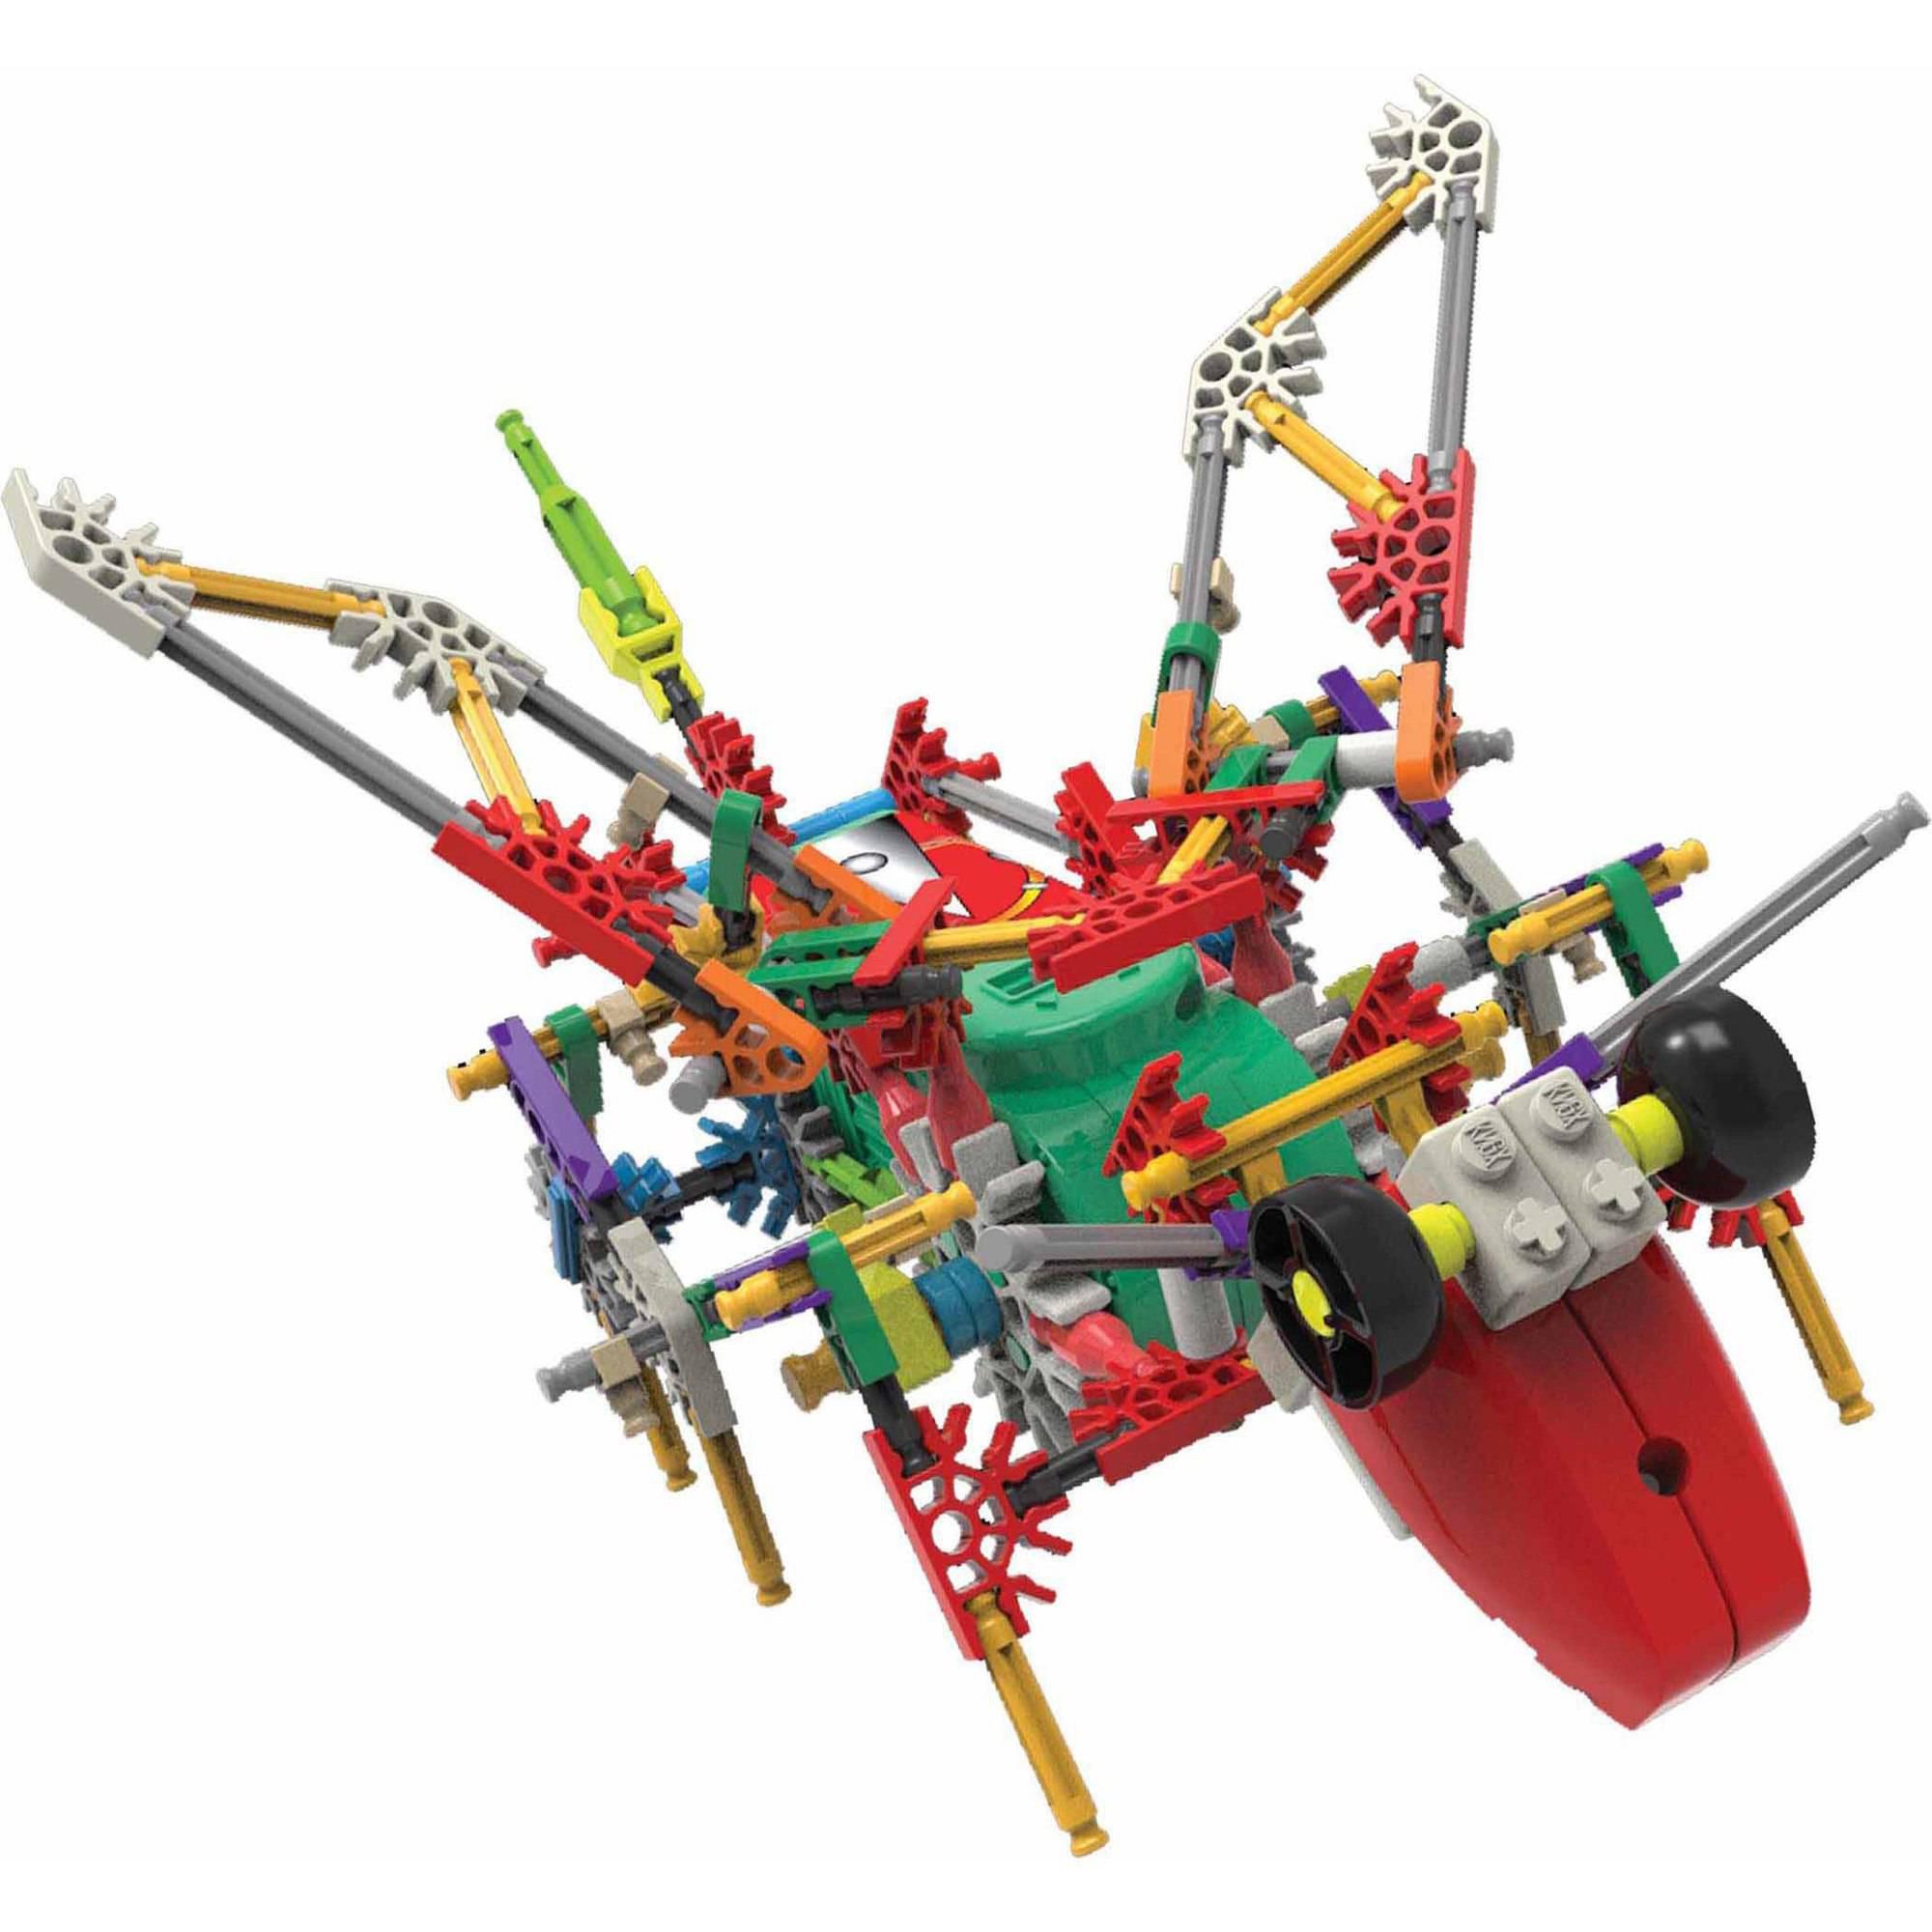 K'NEX Robo-Sting Building Set